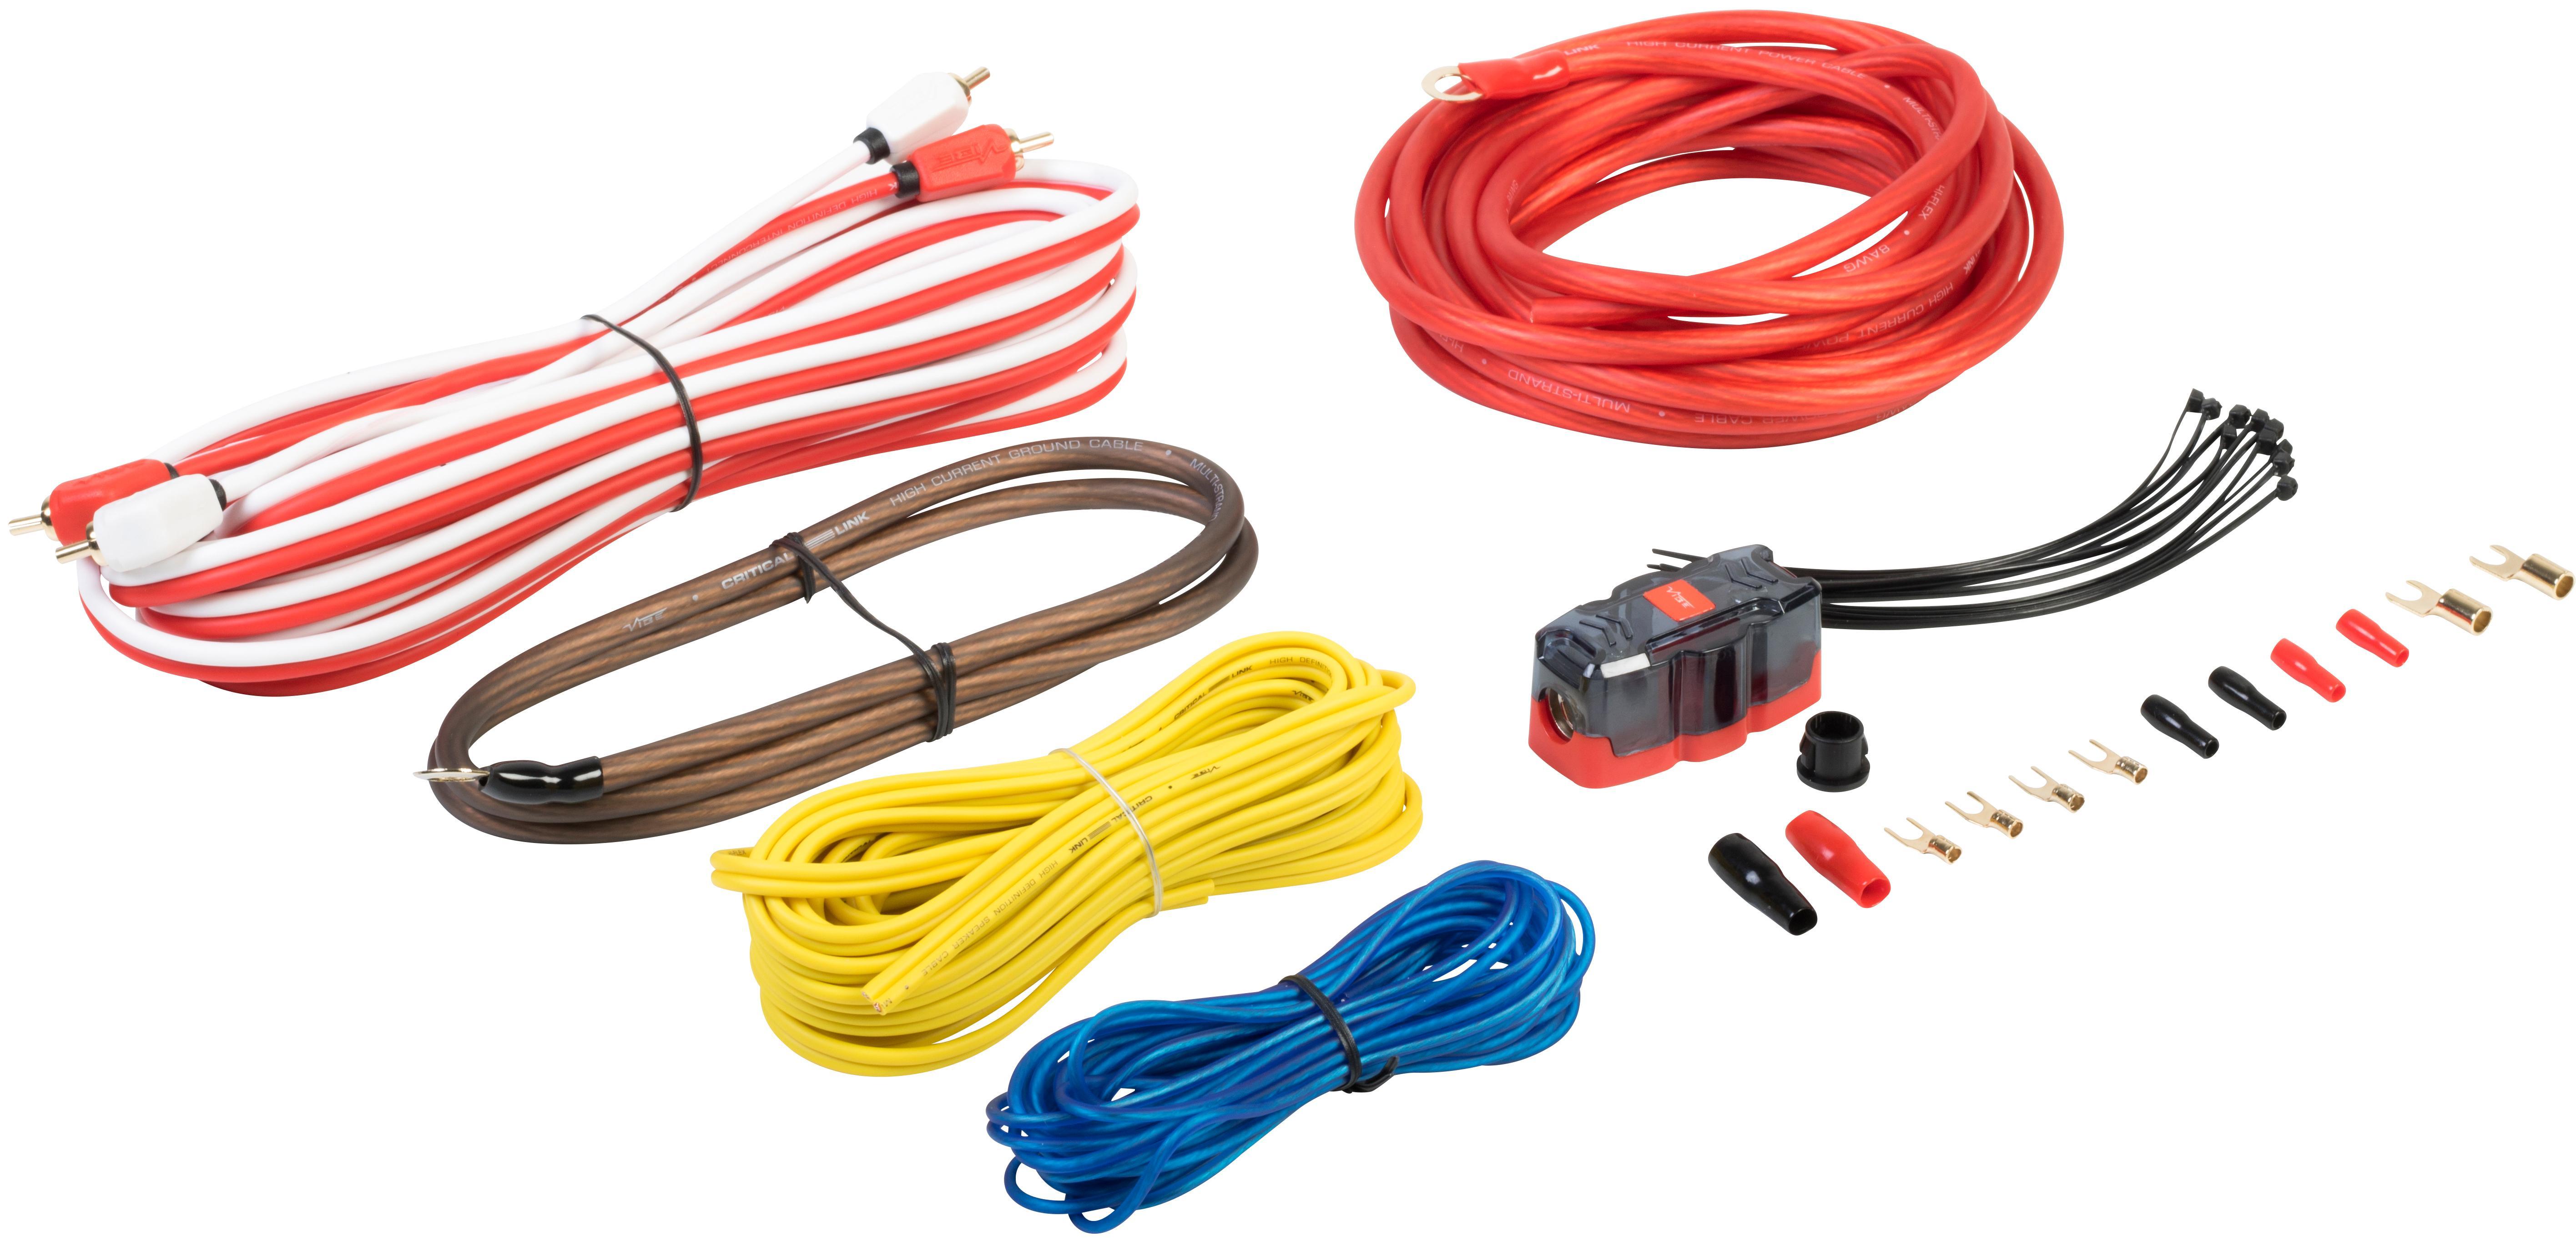 Car Amp Wiring Kit Maplin - Go Wiring Diagrams Nikkai Car Stereo Wiring Diagram on